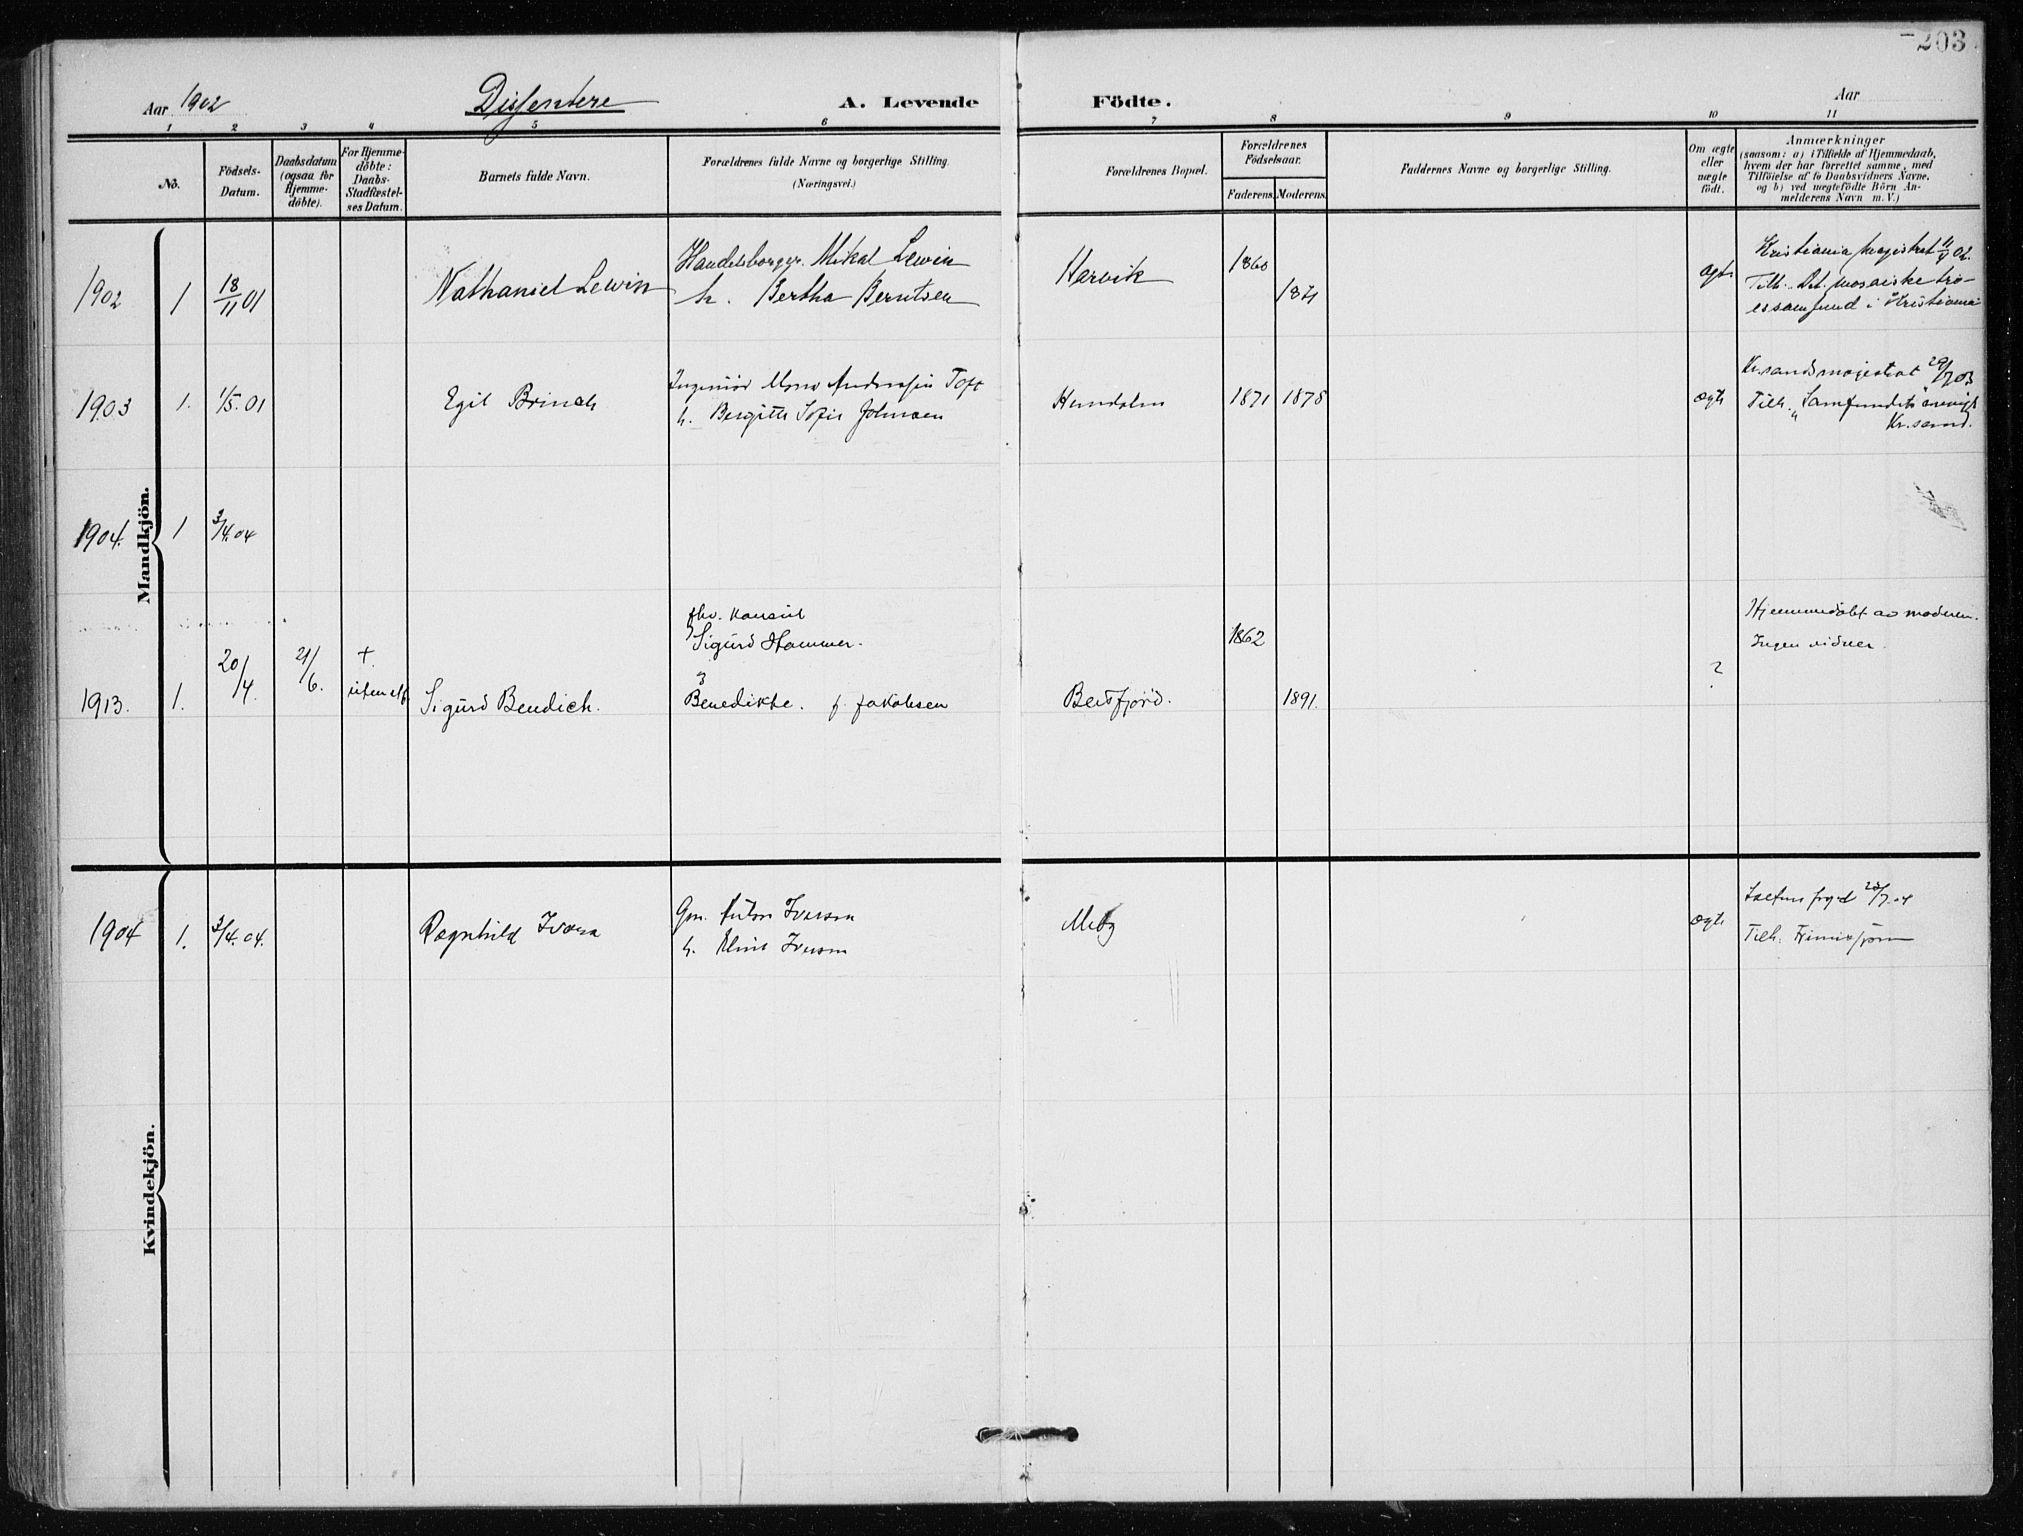 SAT, Ministerialprotokoller, klokkerbøker og fødselsregistre - Nordland, 866/L0941: Ministerialbok nr. 866A04, 1901-1917, s. 203